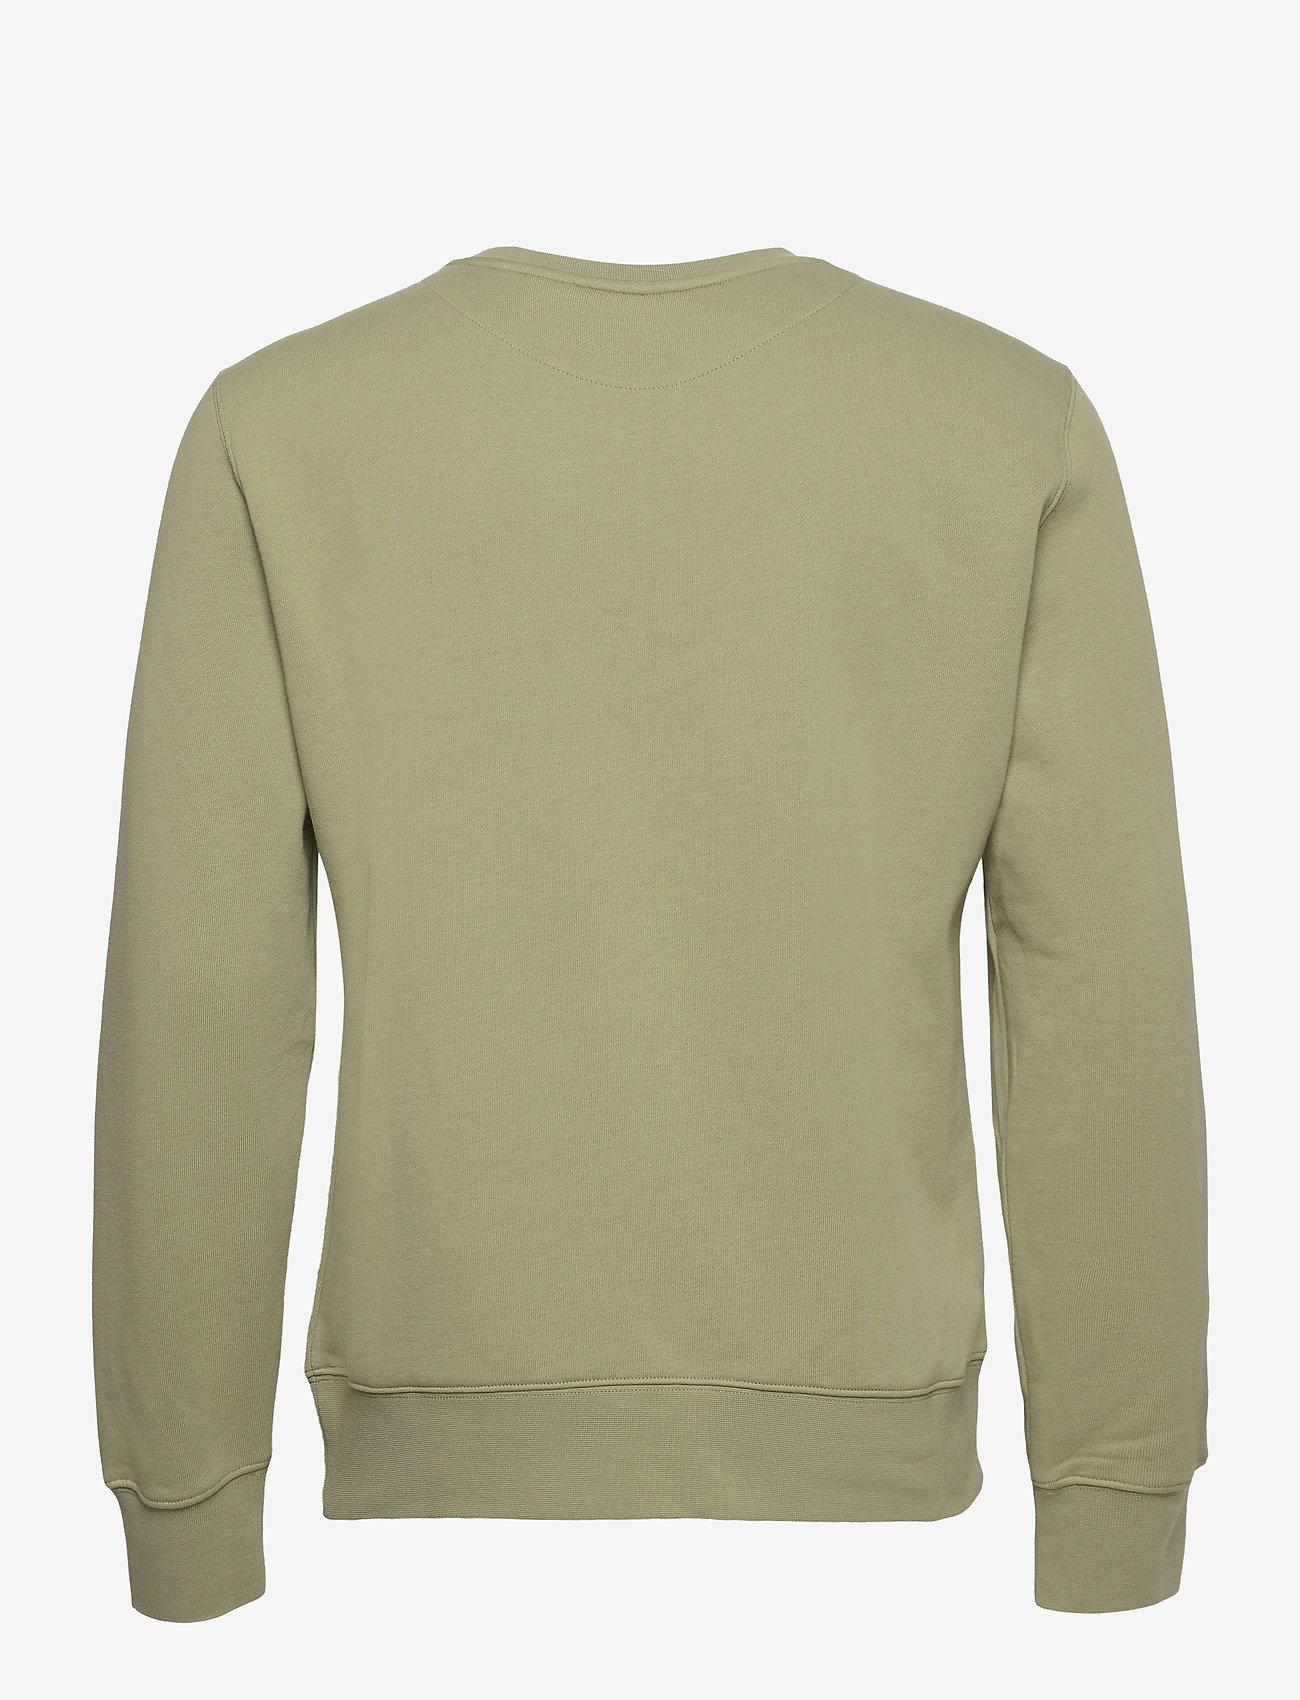 Björn Borg - CREW CENTRE CENTRE - basic sweatshirts - oil green - 1